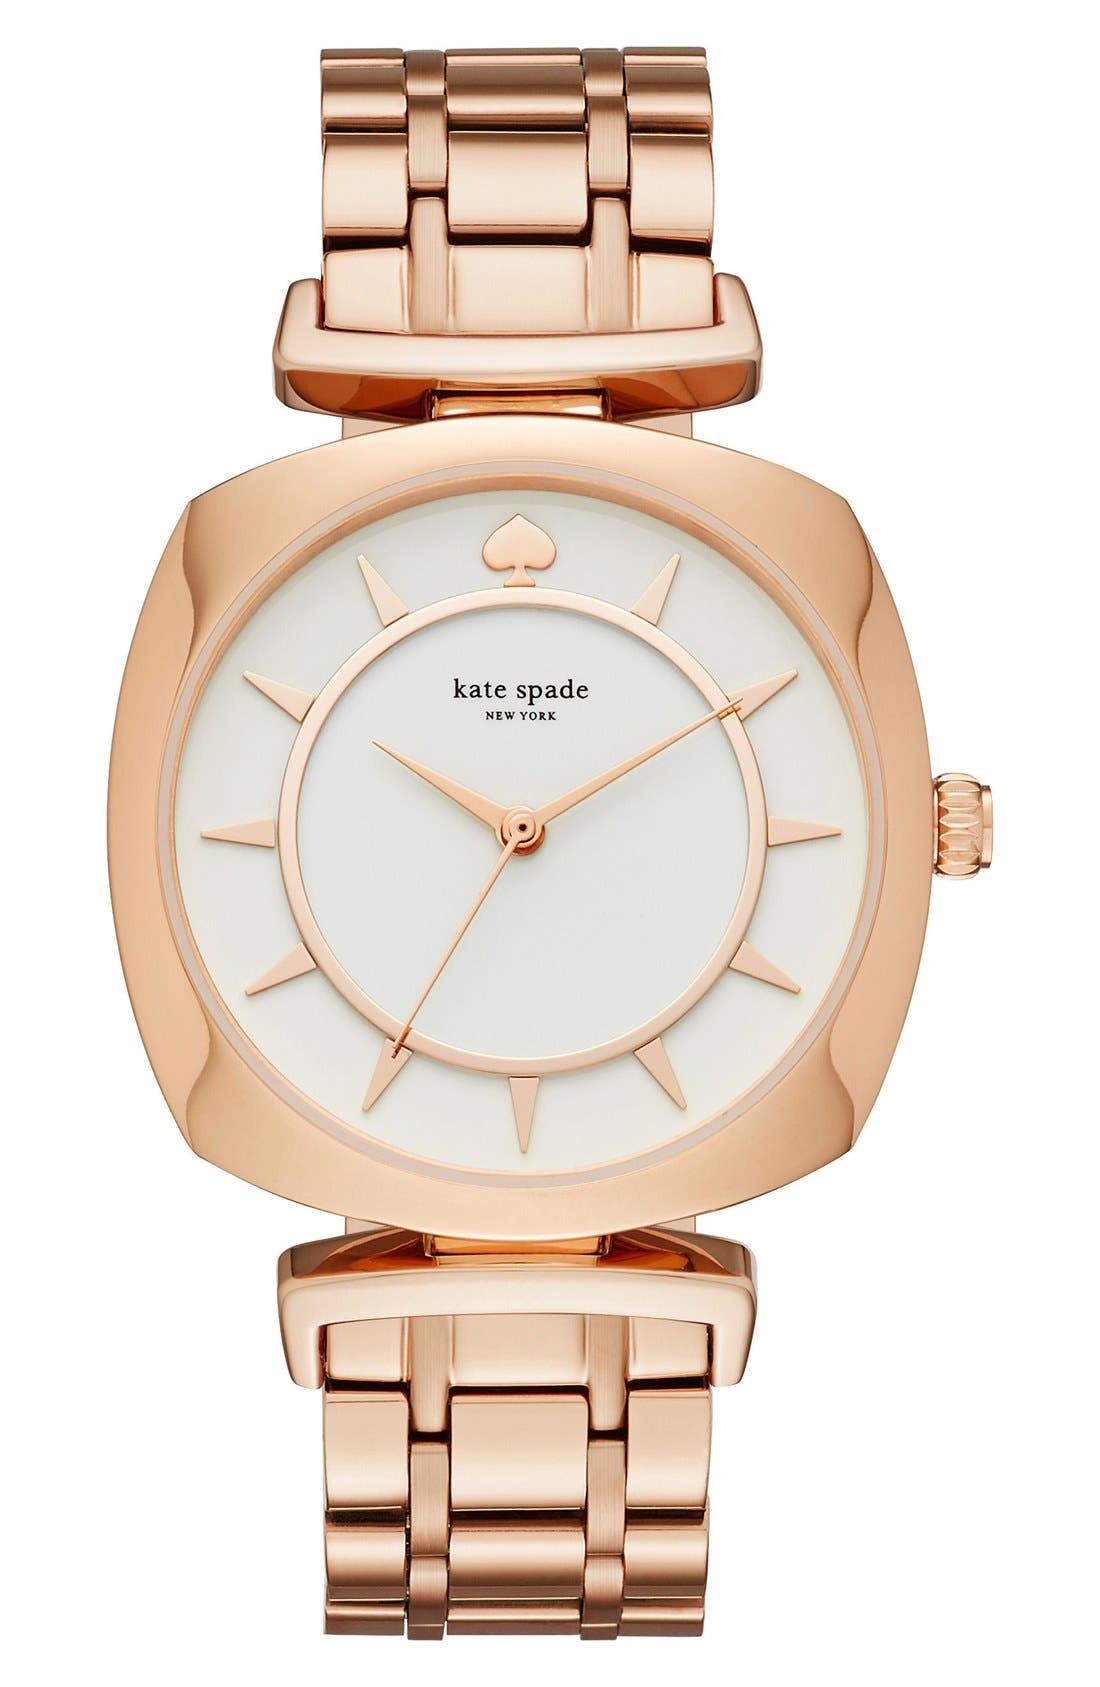 KATE SPADE NEW YORK barrow bracelet watch, 34mm